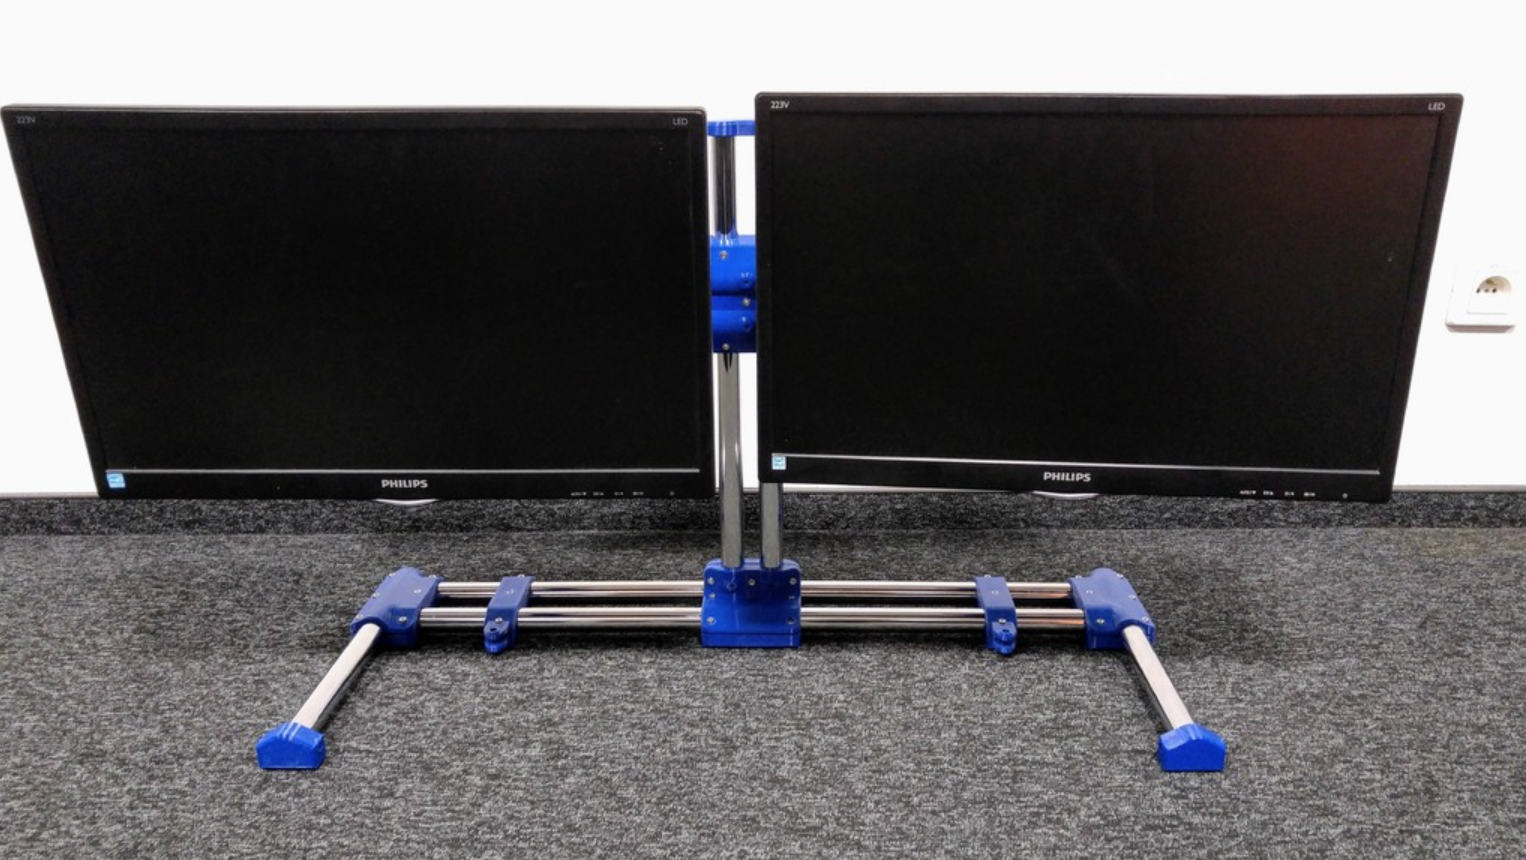 Capture d'écran 2018-01-17 à 15.31.22.png Download free STL file Modular dual monitor stand • 3D printer object, _MSA_